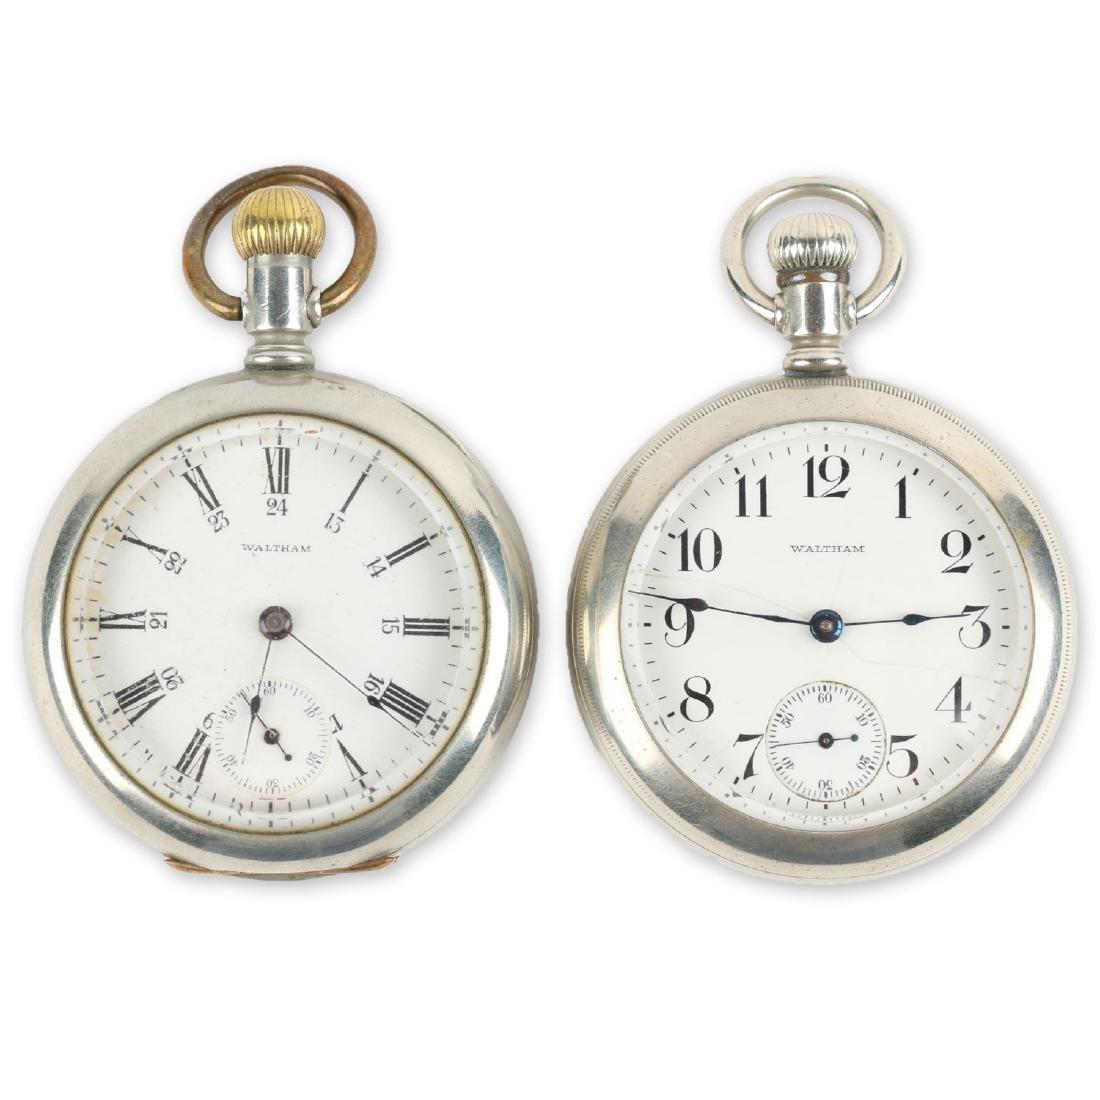 Two (2) 18S Waltham 1883 Model Nickel Silver Pocket